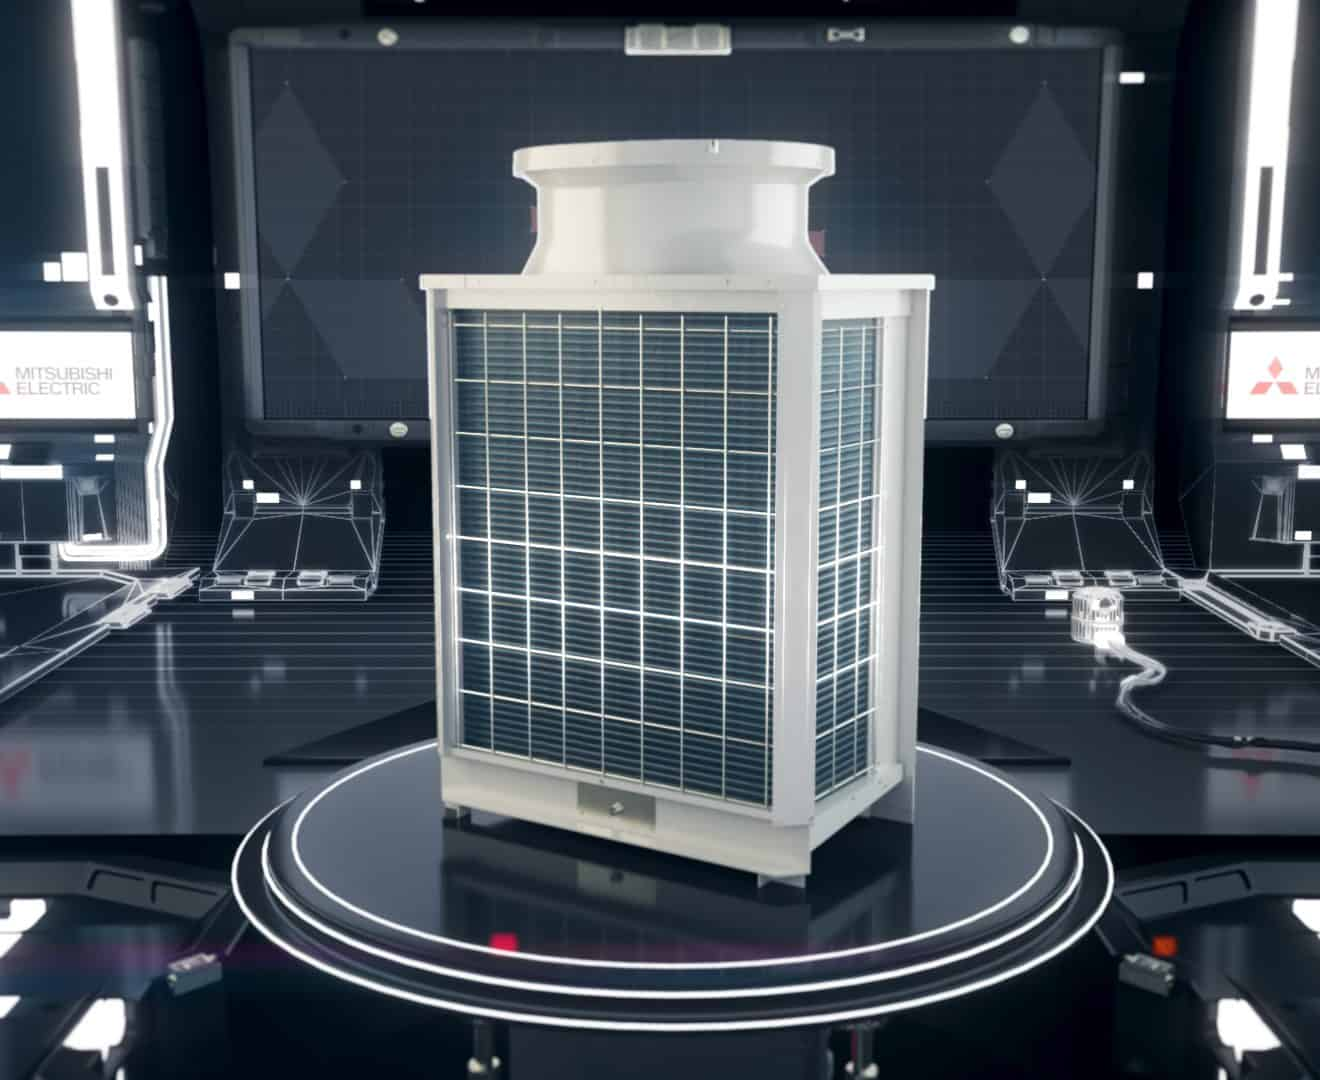 Mitsubishi Electirc product launch 3d design